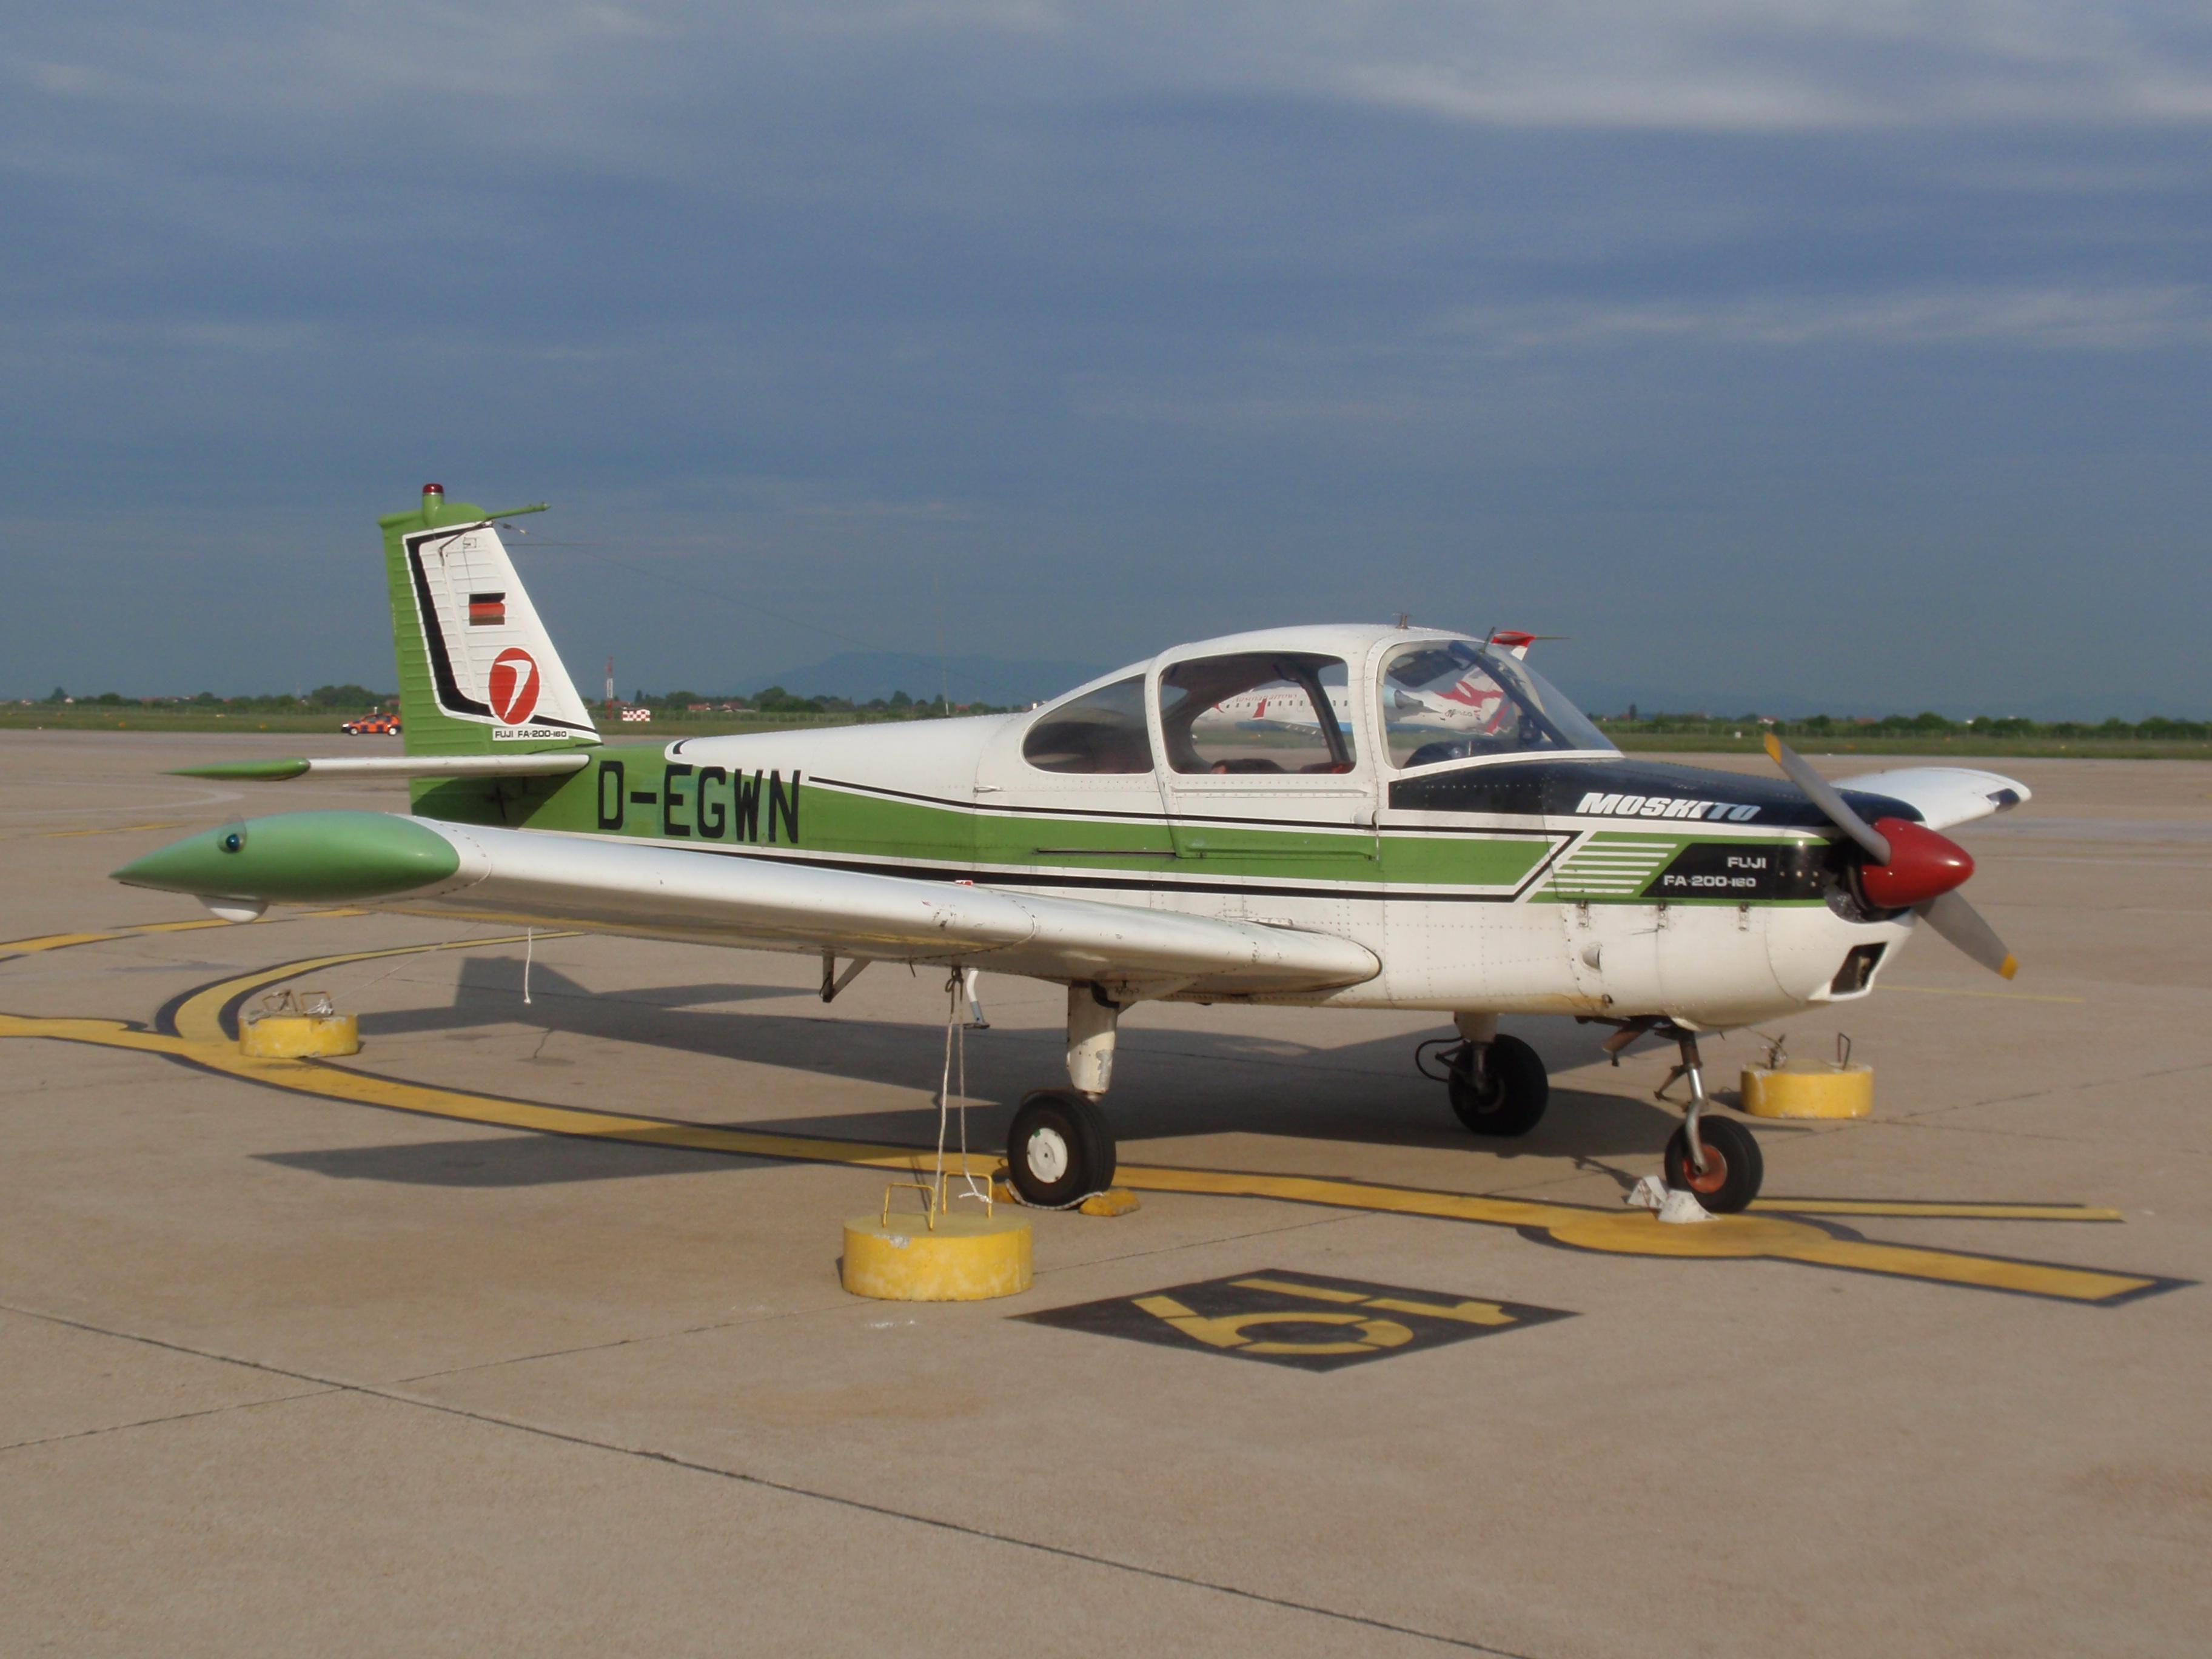 Fuji_FA-200-180.JPG